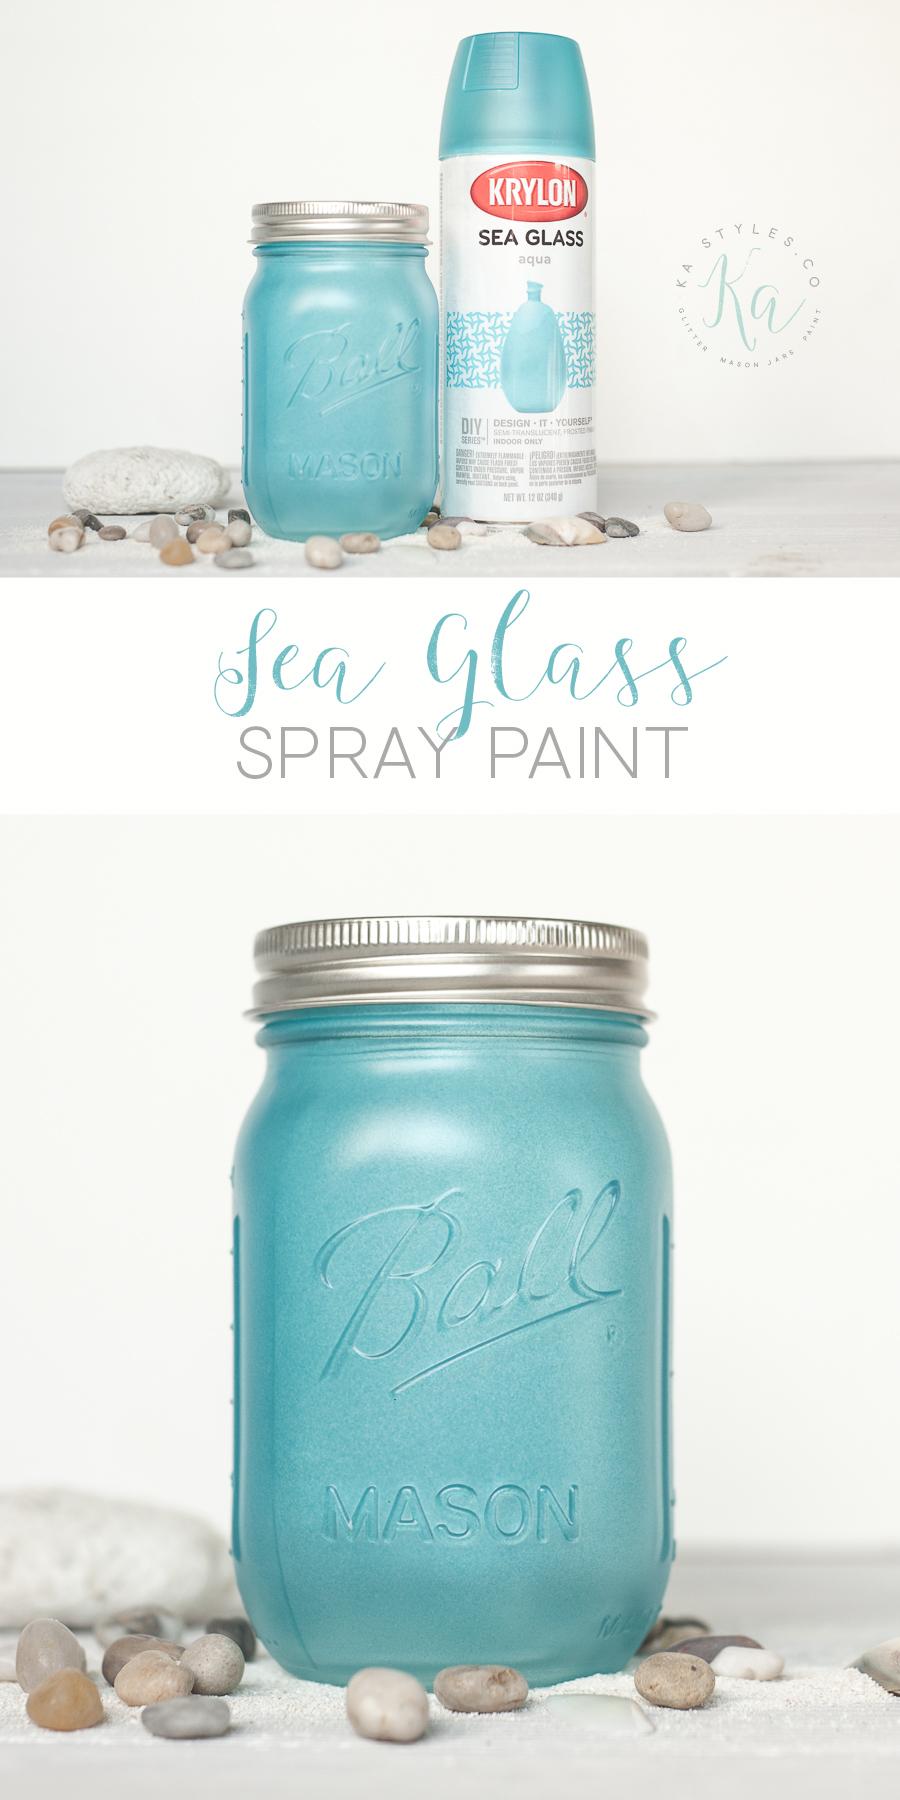 Krylon Sea Glass spray paint.